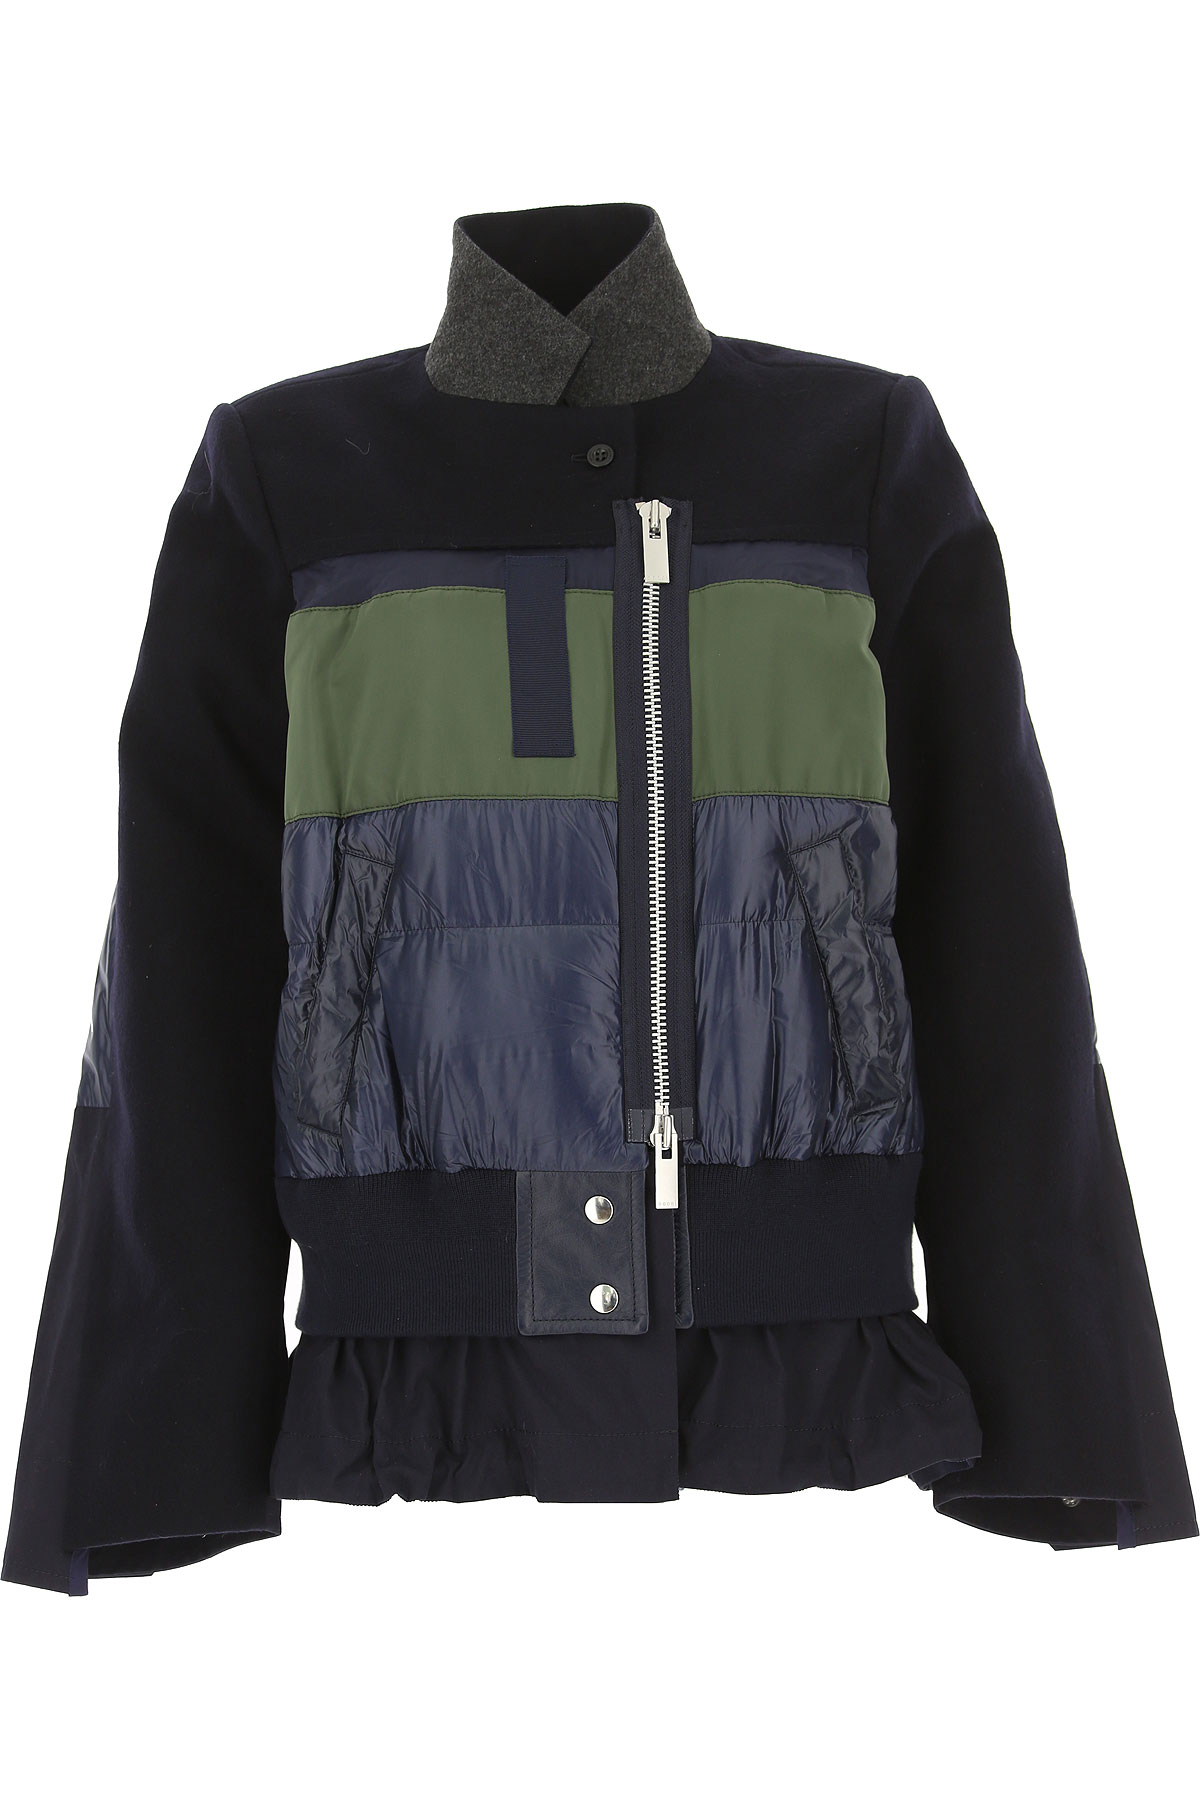 Image of Sacai Jacket for Women, navy, Wool, 2017, US 0 - UK 4 - EU 34 - IT 38 US 2 - UK 6 - EU 36 - IT 40 US 4 - UK 8 - EU 38 - IT 42 US 6 - UK 10 - EU 40 - IT 44 US 8 - UK 12 - EU 42 - IT 46